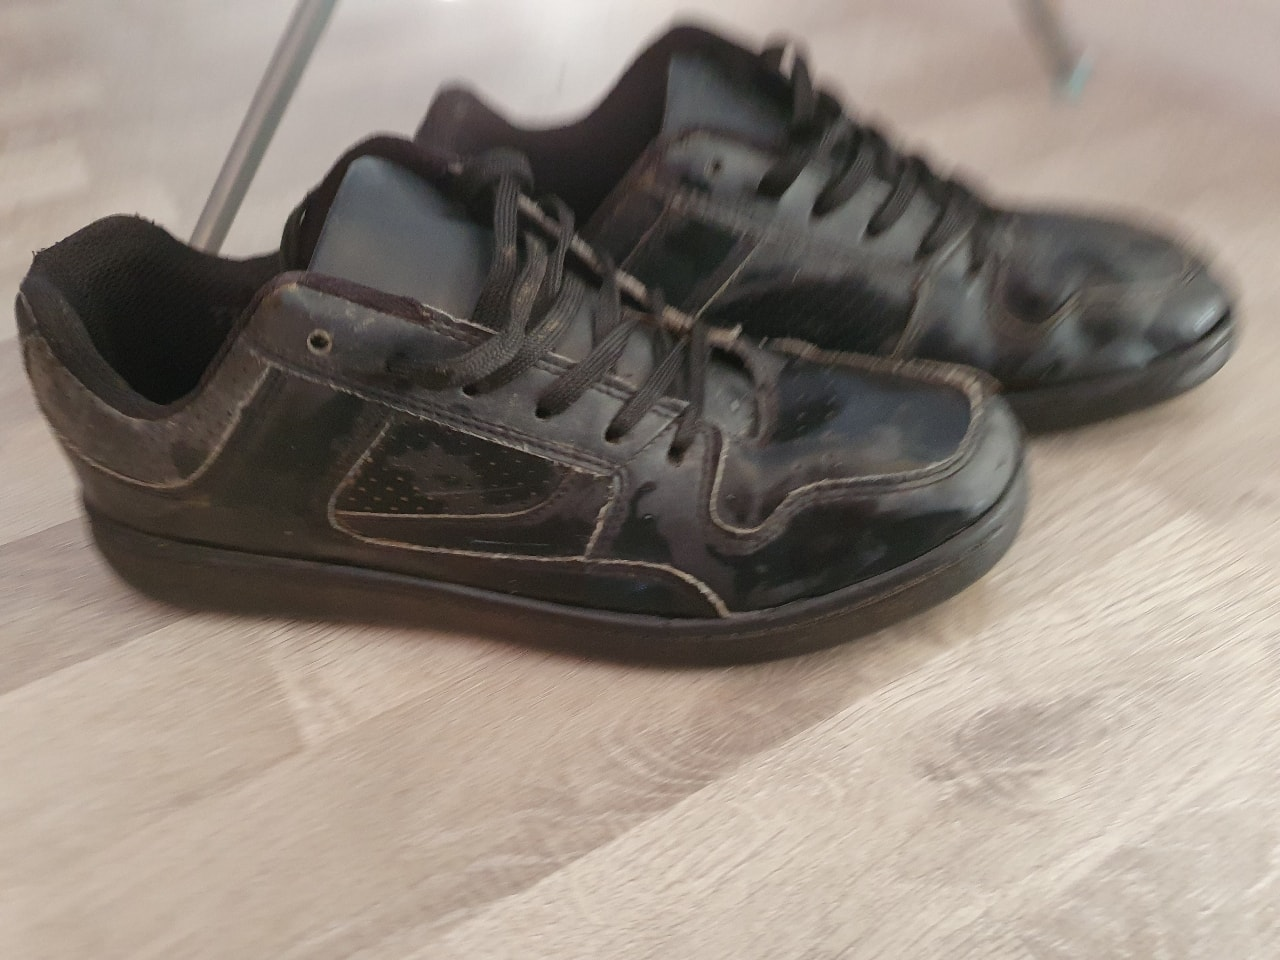 Boys size 7 school shoes (adults)